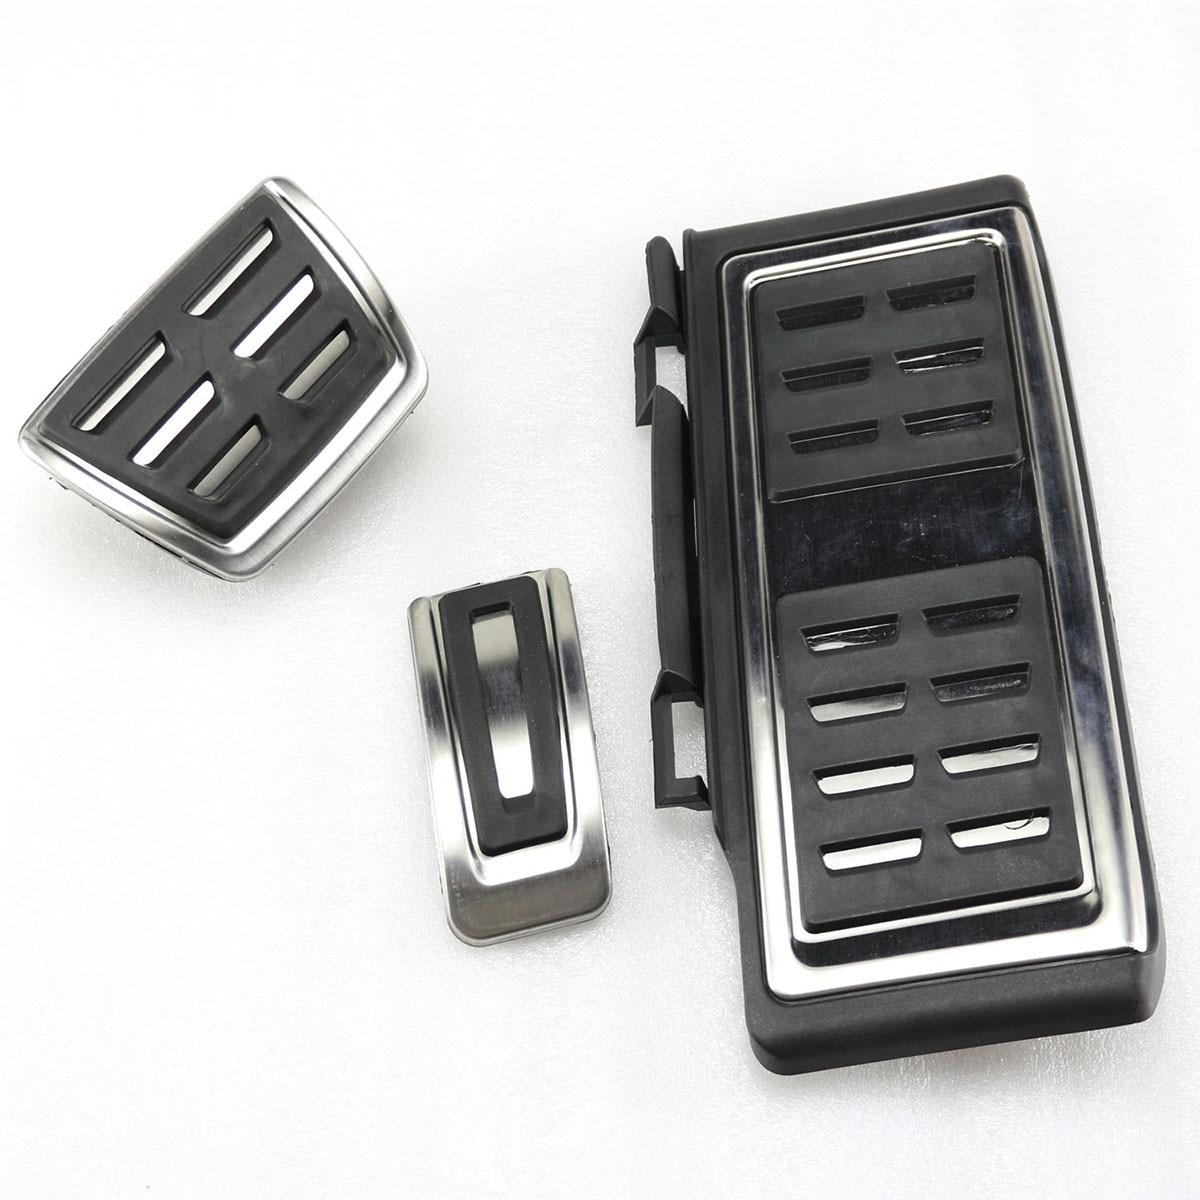 OEM 3pcs Sport Fuel Sport Fuel Brake Foot Rest AT Pedals For VW Golf MK7 No Drill